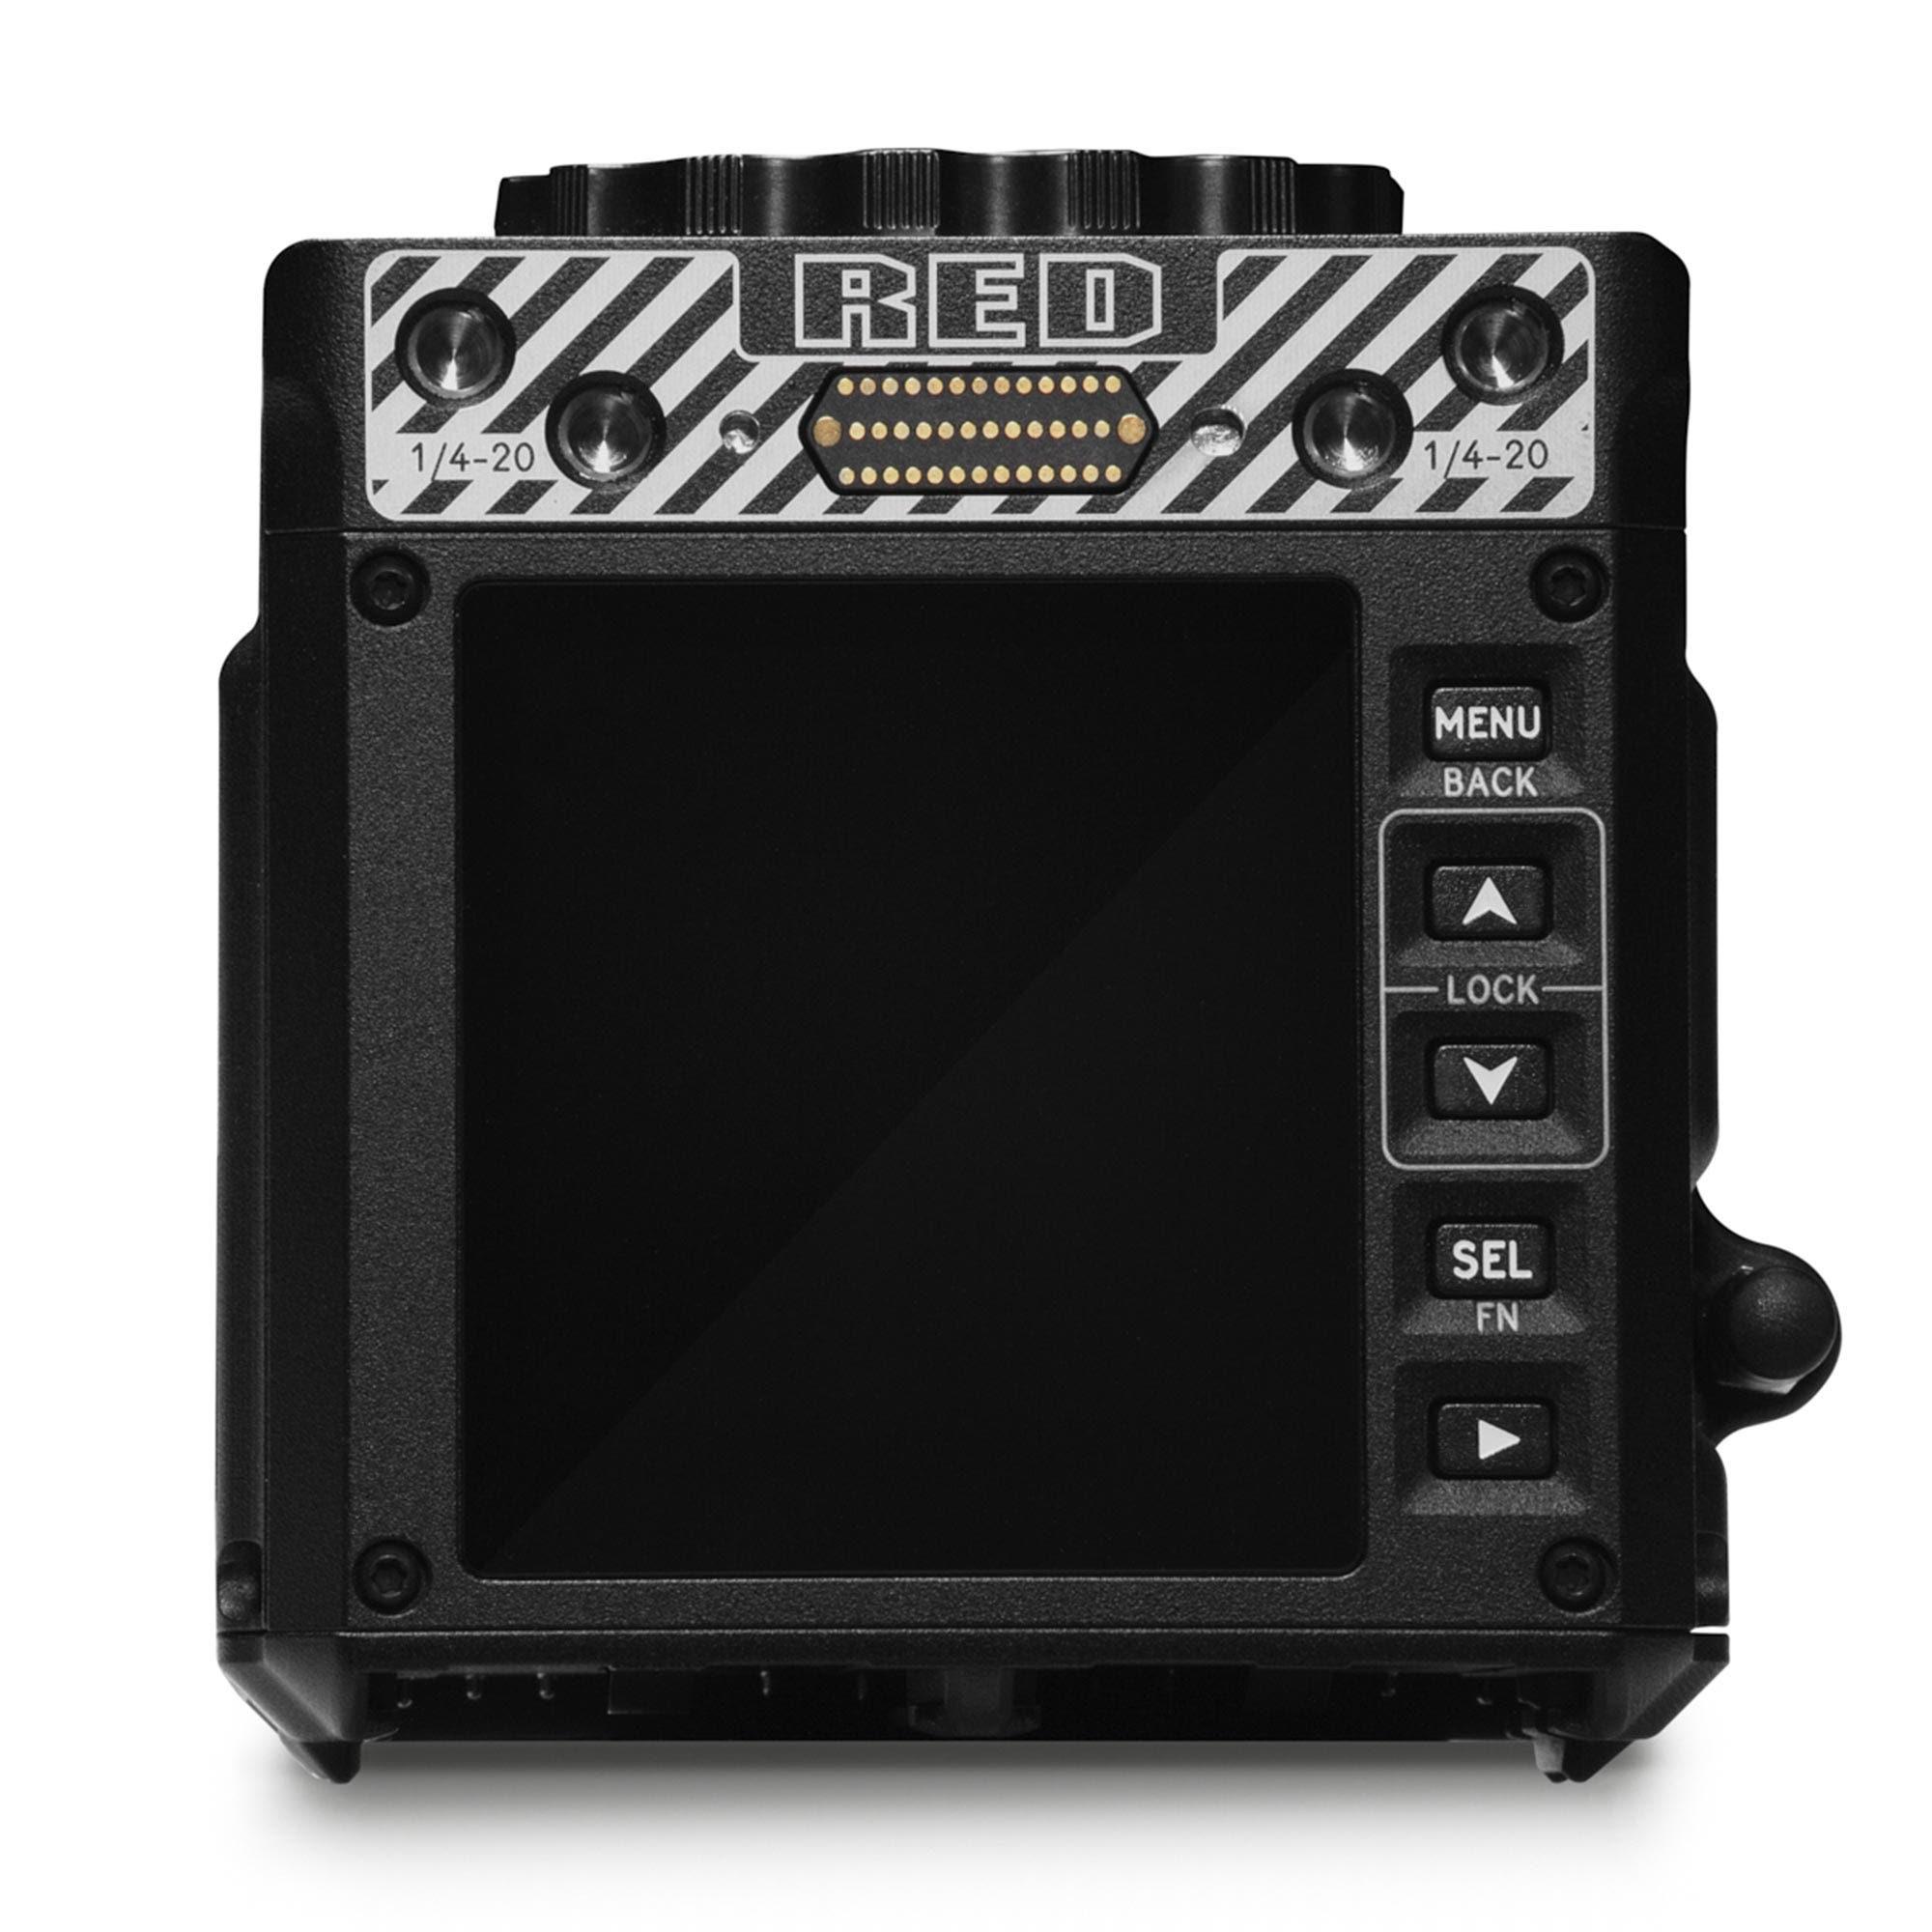 RED Digital Cinema KOMODO 6K Camera - Black Edition